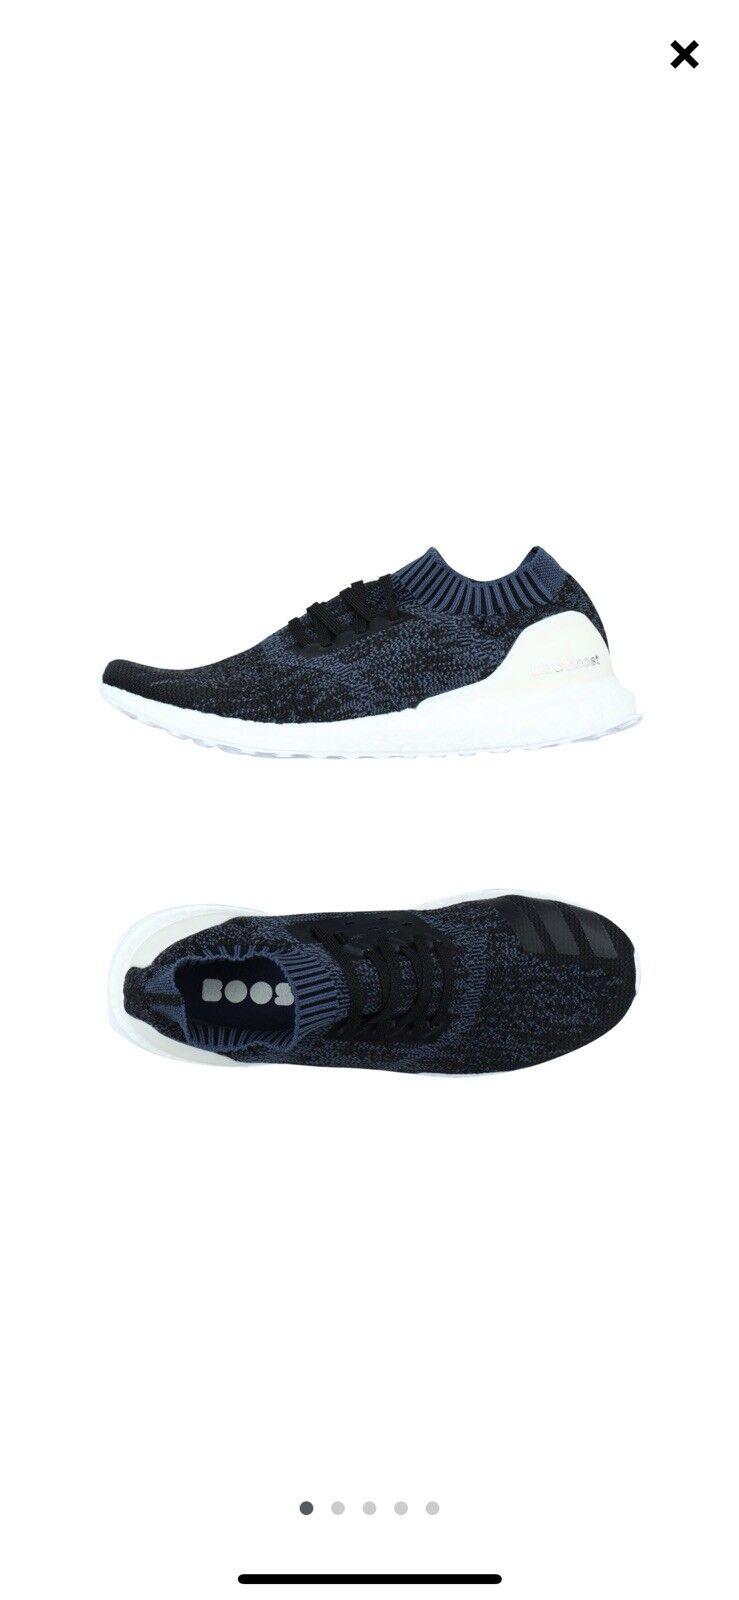 Uomo Uomo Uomo Adidas Scarpe Da Ginnastica, Ultra Boost PAPPAGALLINI, Blu, UK8.5 9060ce